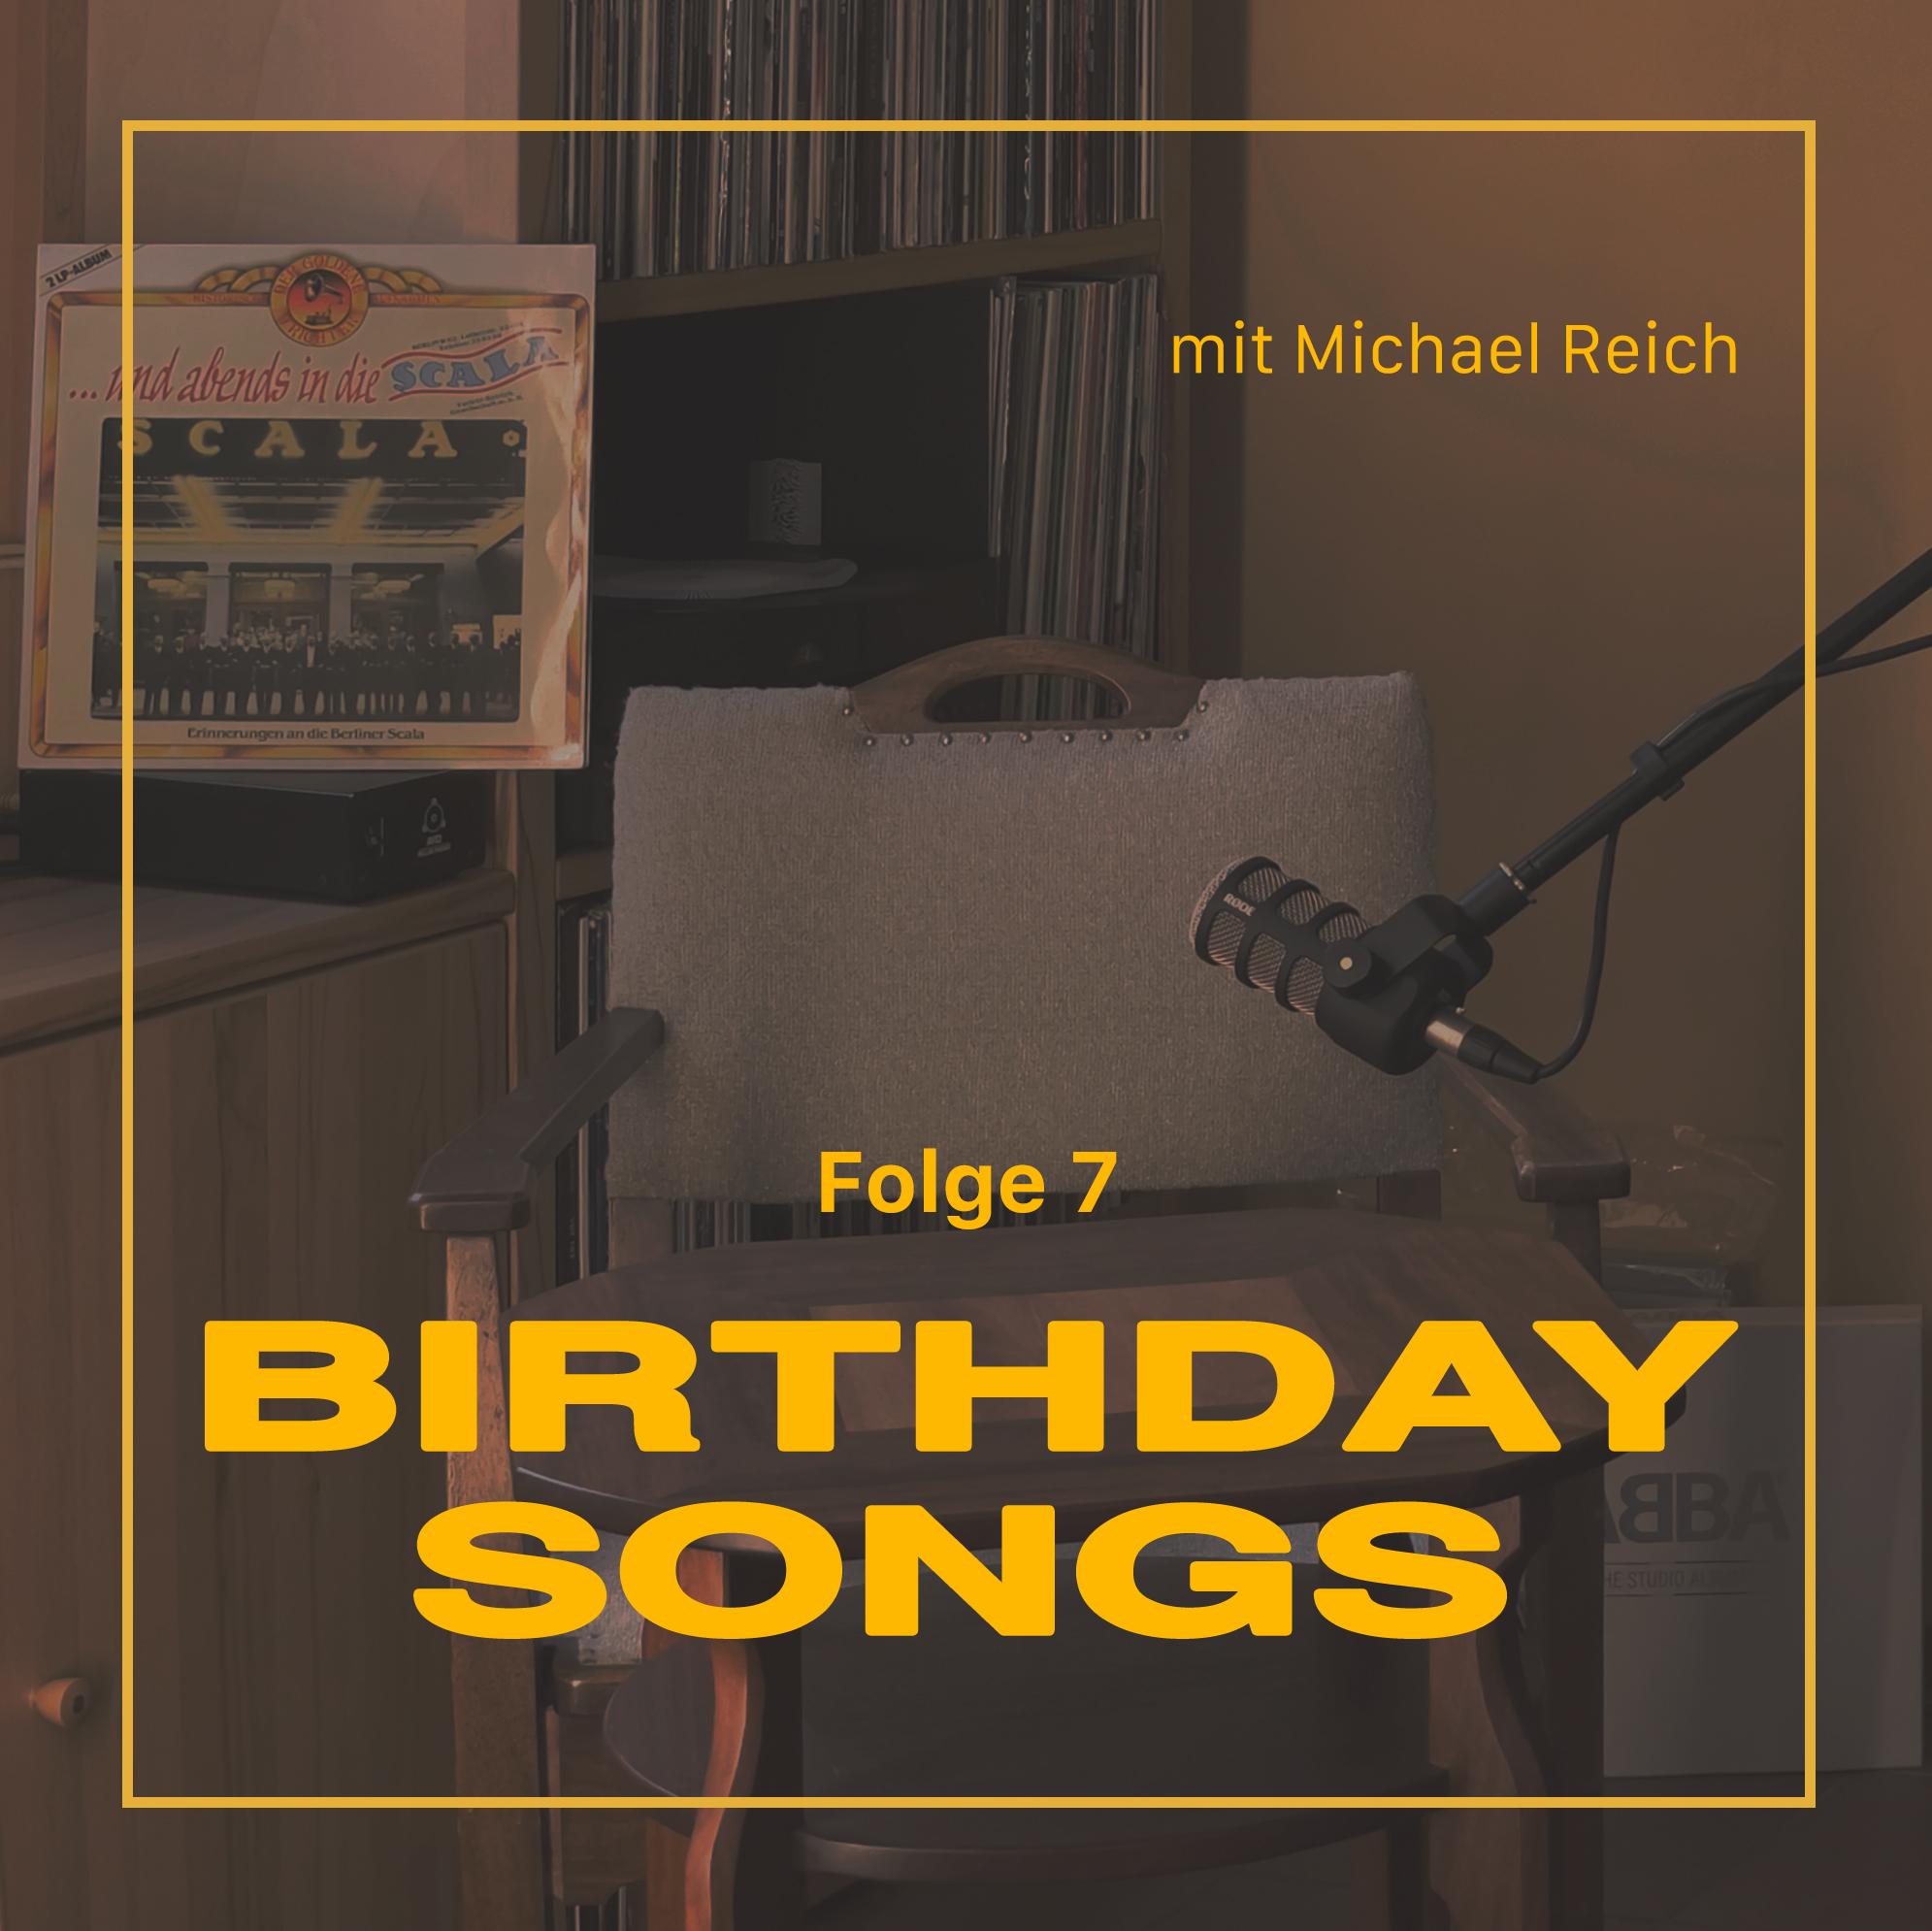 Birthday Songs Folge 7